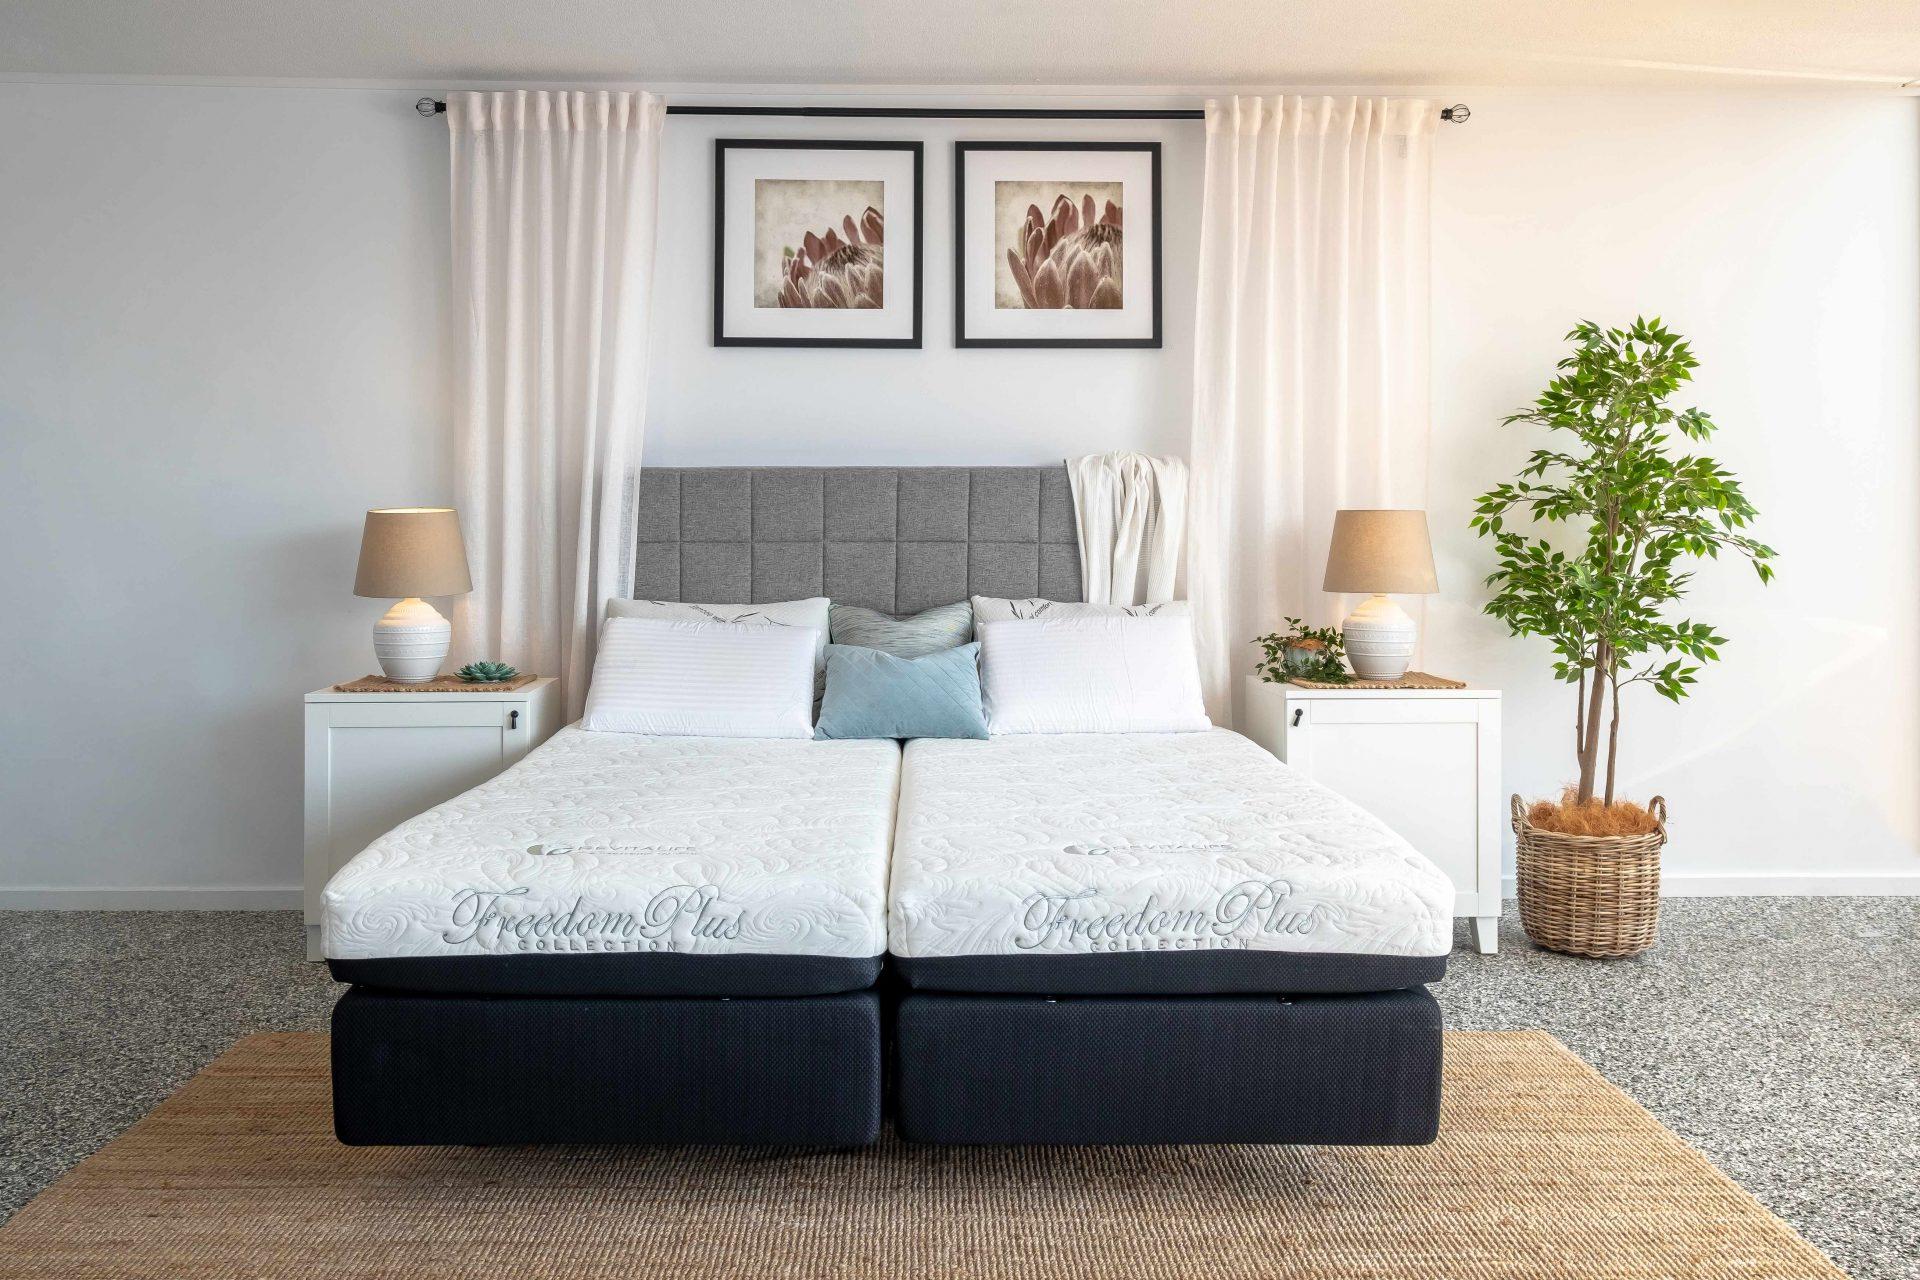 Revitalife Adjustable bed and Memory foam mattress